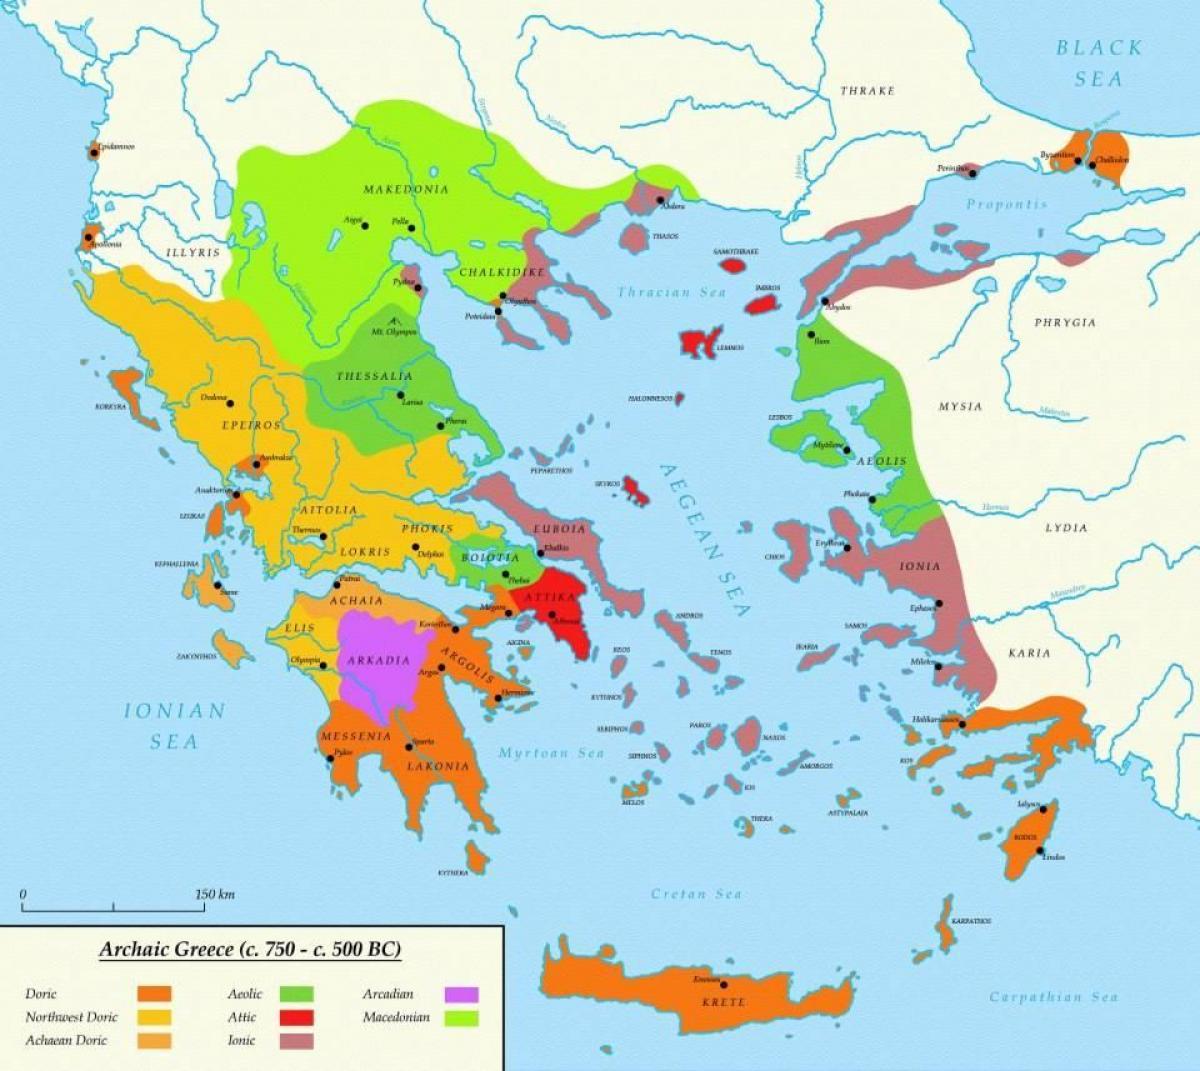 karte antikes griechenland Athen das Antike Griechenland Karte   Karte von Athen und sparta